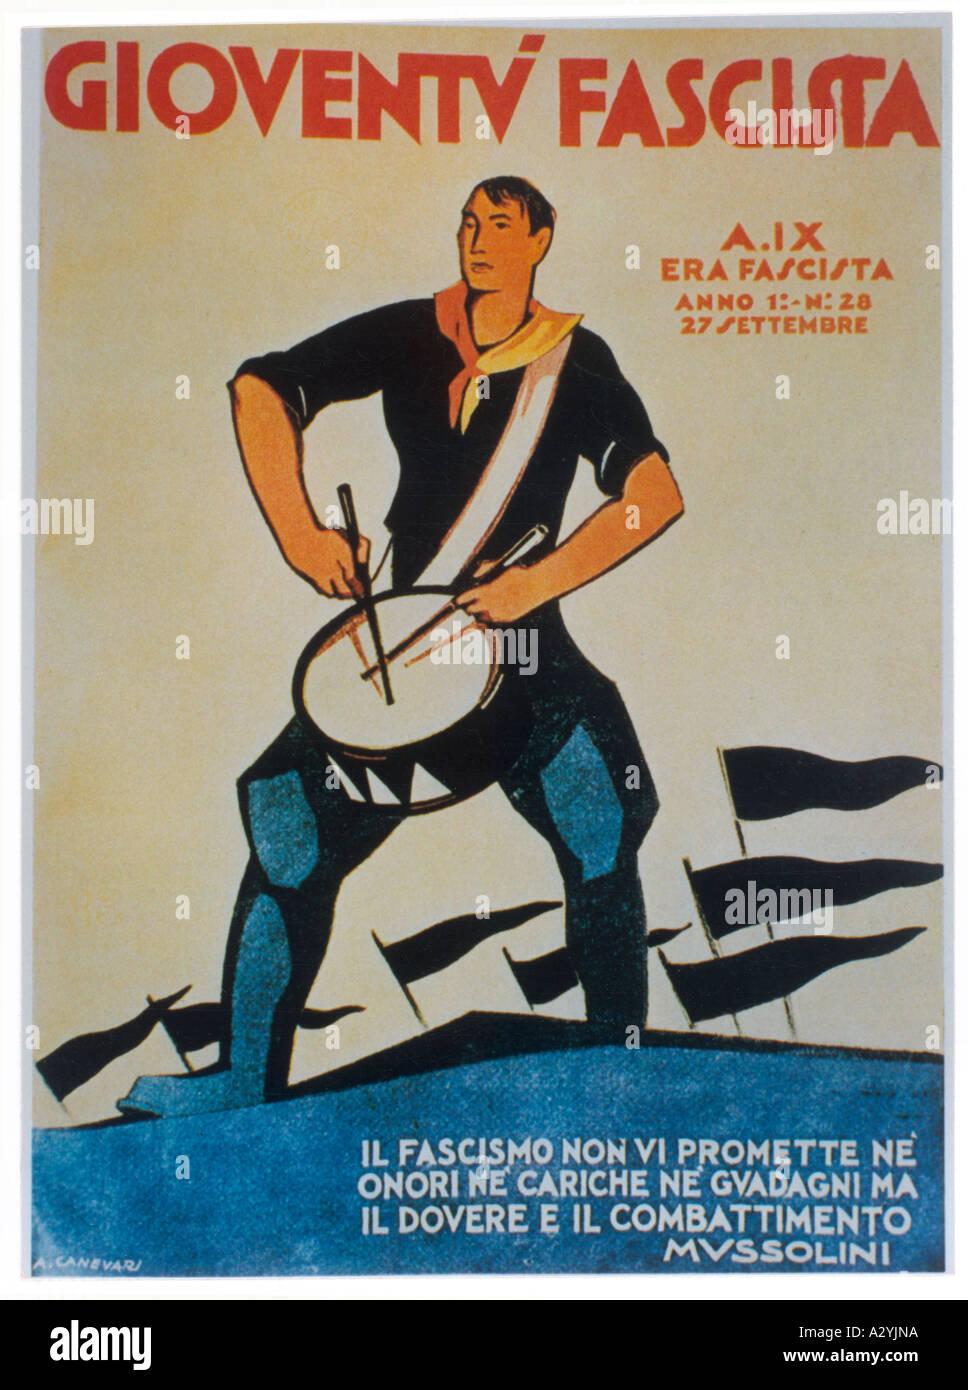 italian fascism stock photos amp italian fascism stock